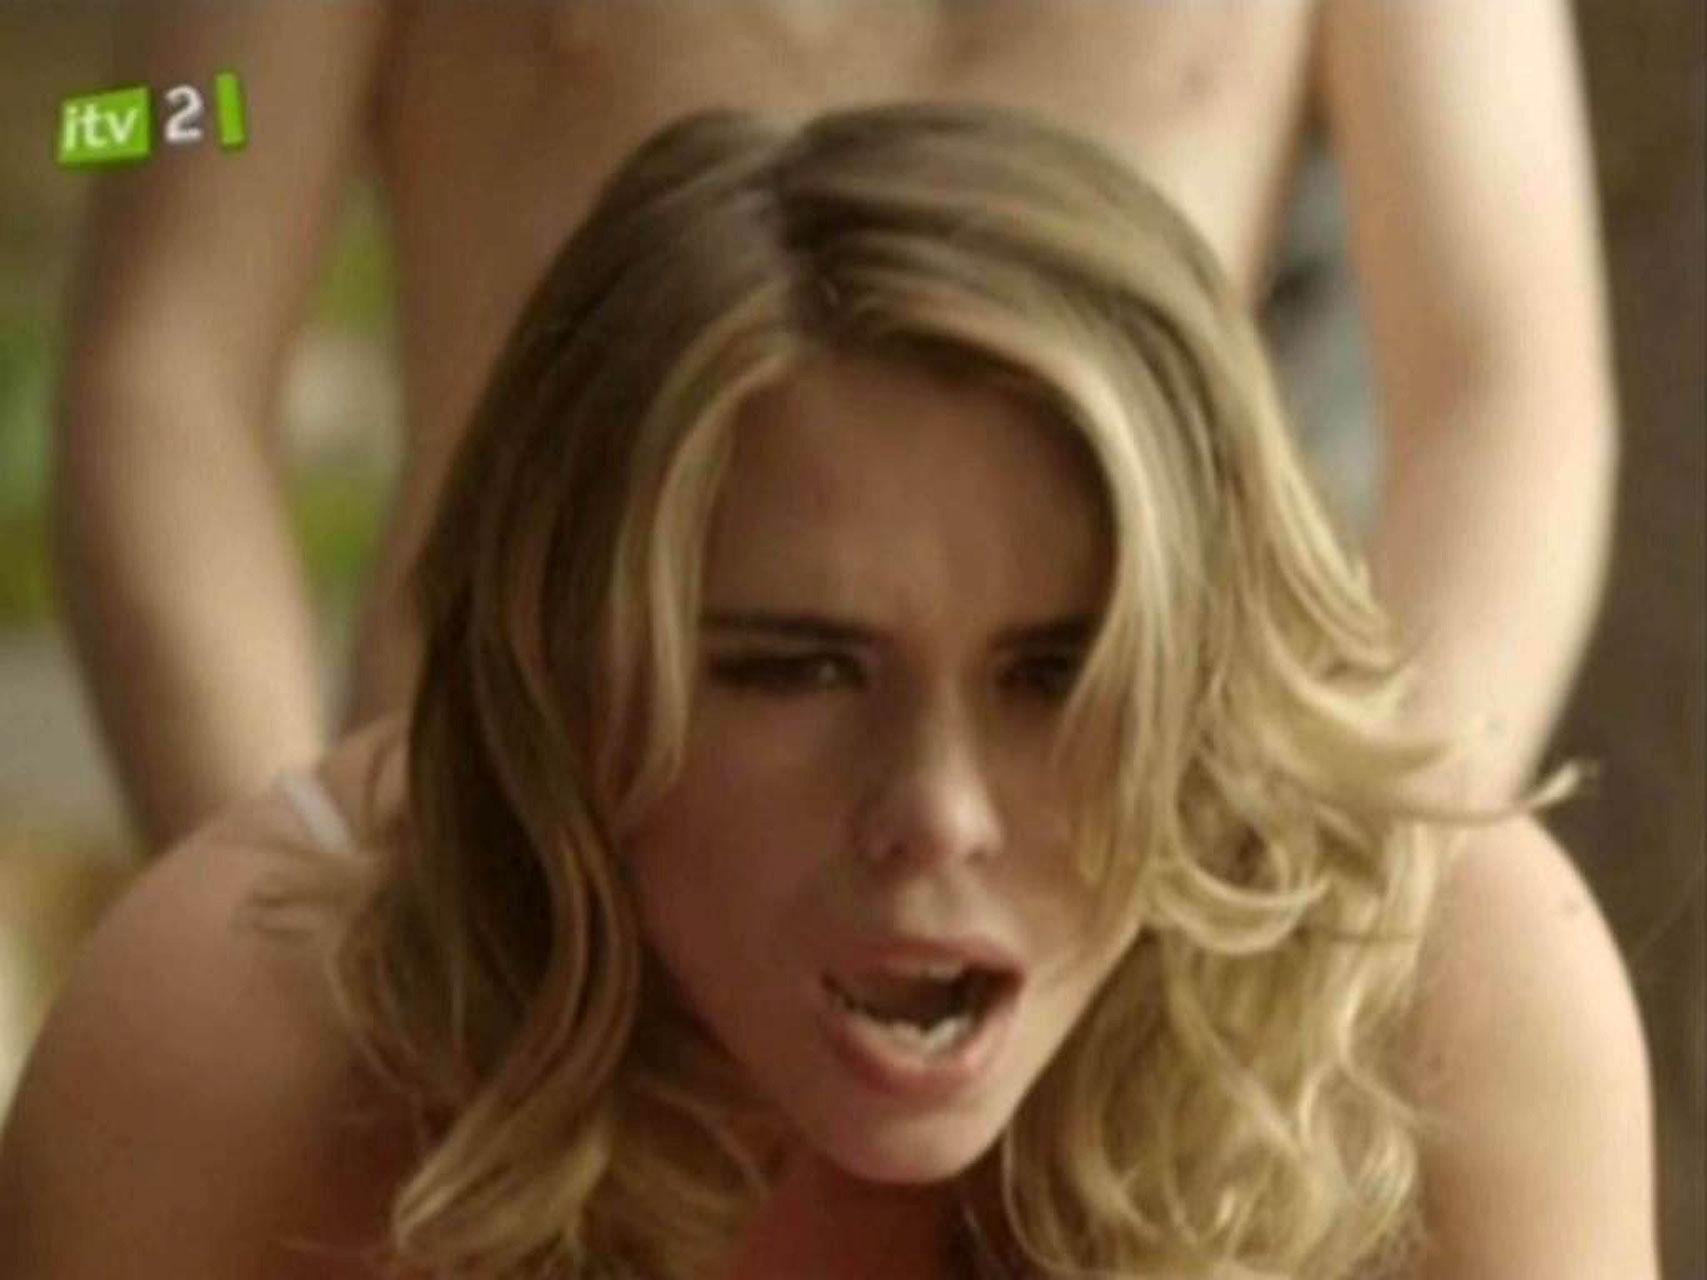 billie piper 06 TheFreeCelebrityMovieArchive.com   Billie Piper nude video gallery ...